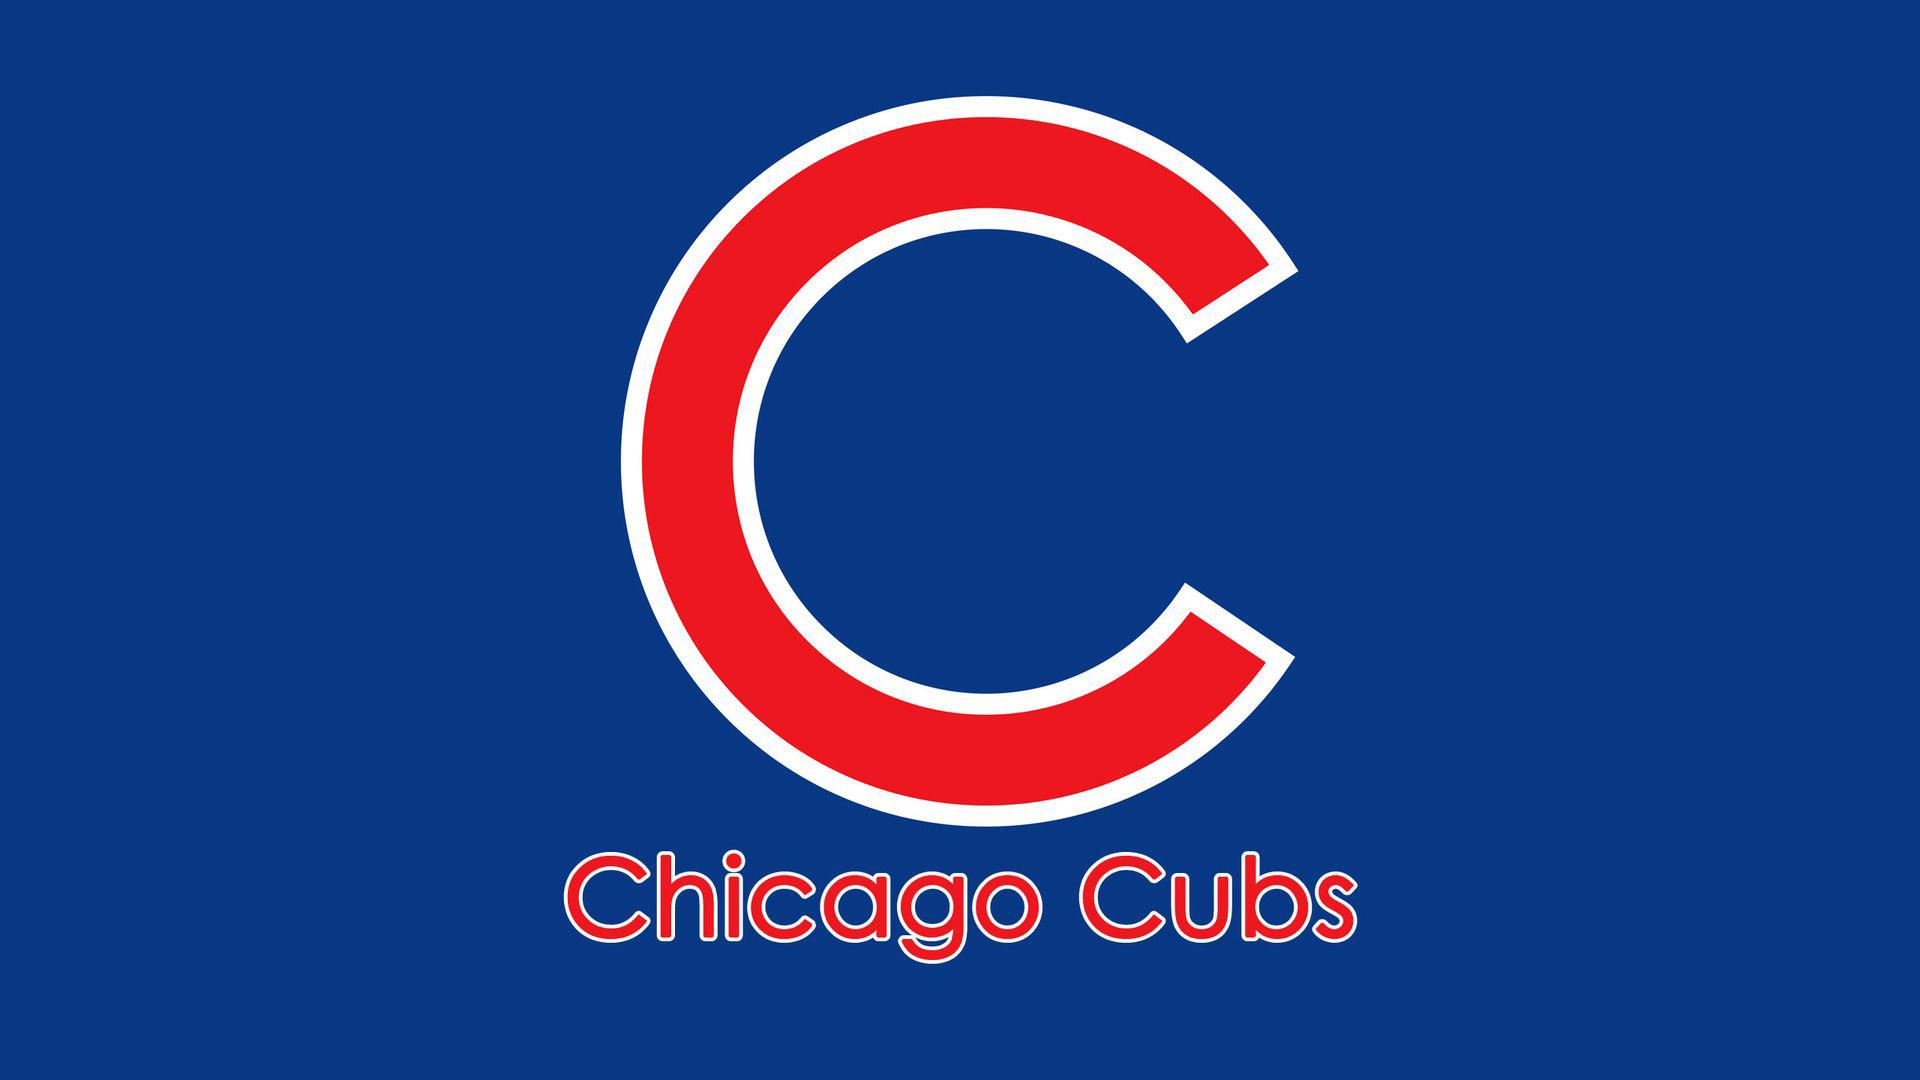 Travel Agency Wallpaper Hd Chicago Cubs Wallpaper Hd Pixelstalk Net